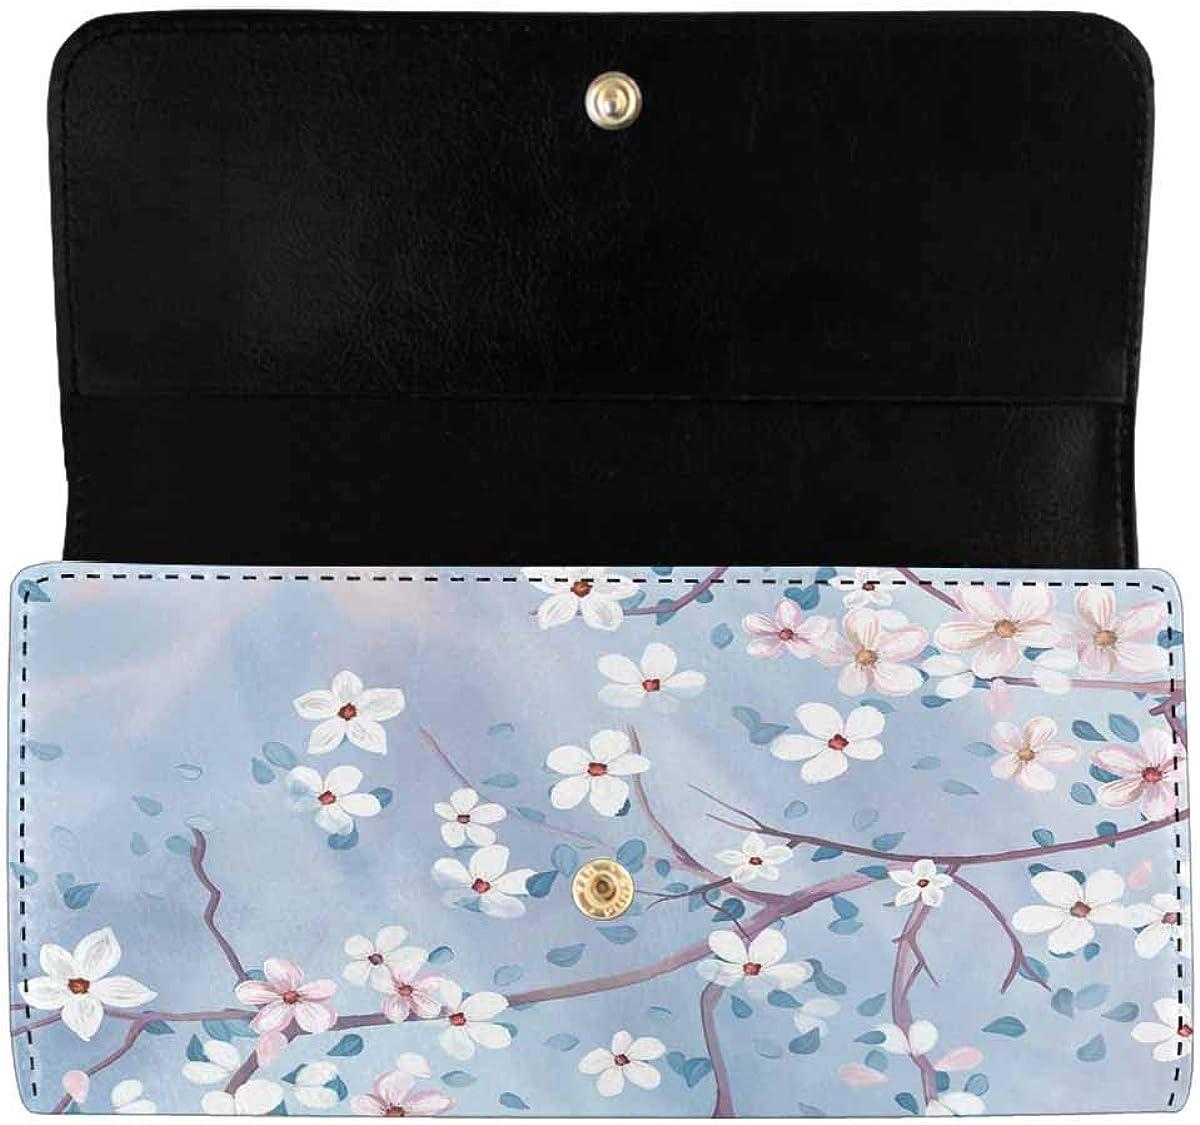 INTERESTPRINT Women's Trifold Clutch Purses Bright Blue Cherry Blossom Card Holder Wallet